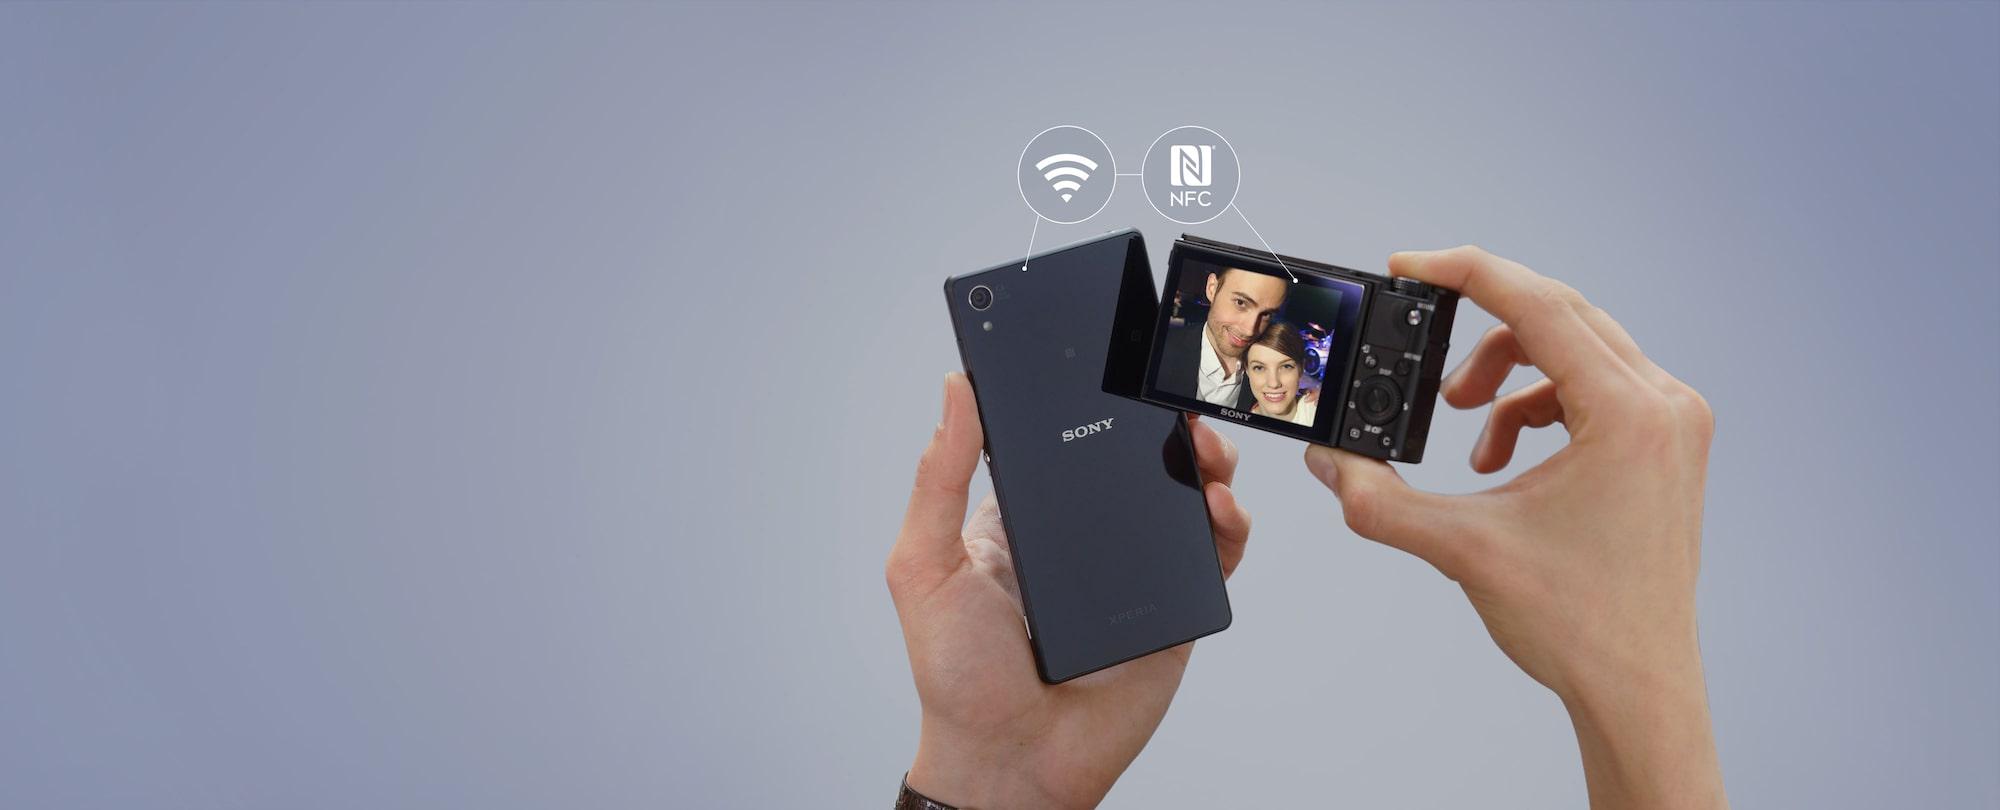 Wi-Fi и NFC